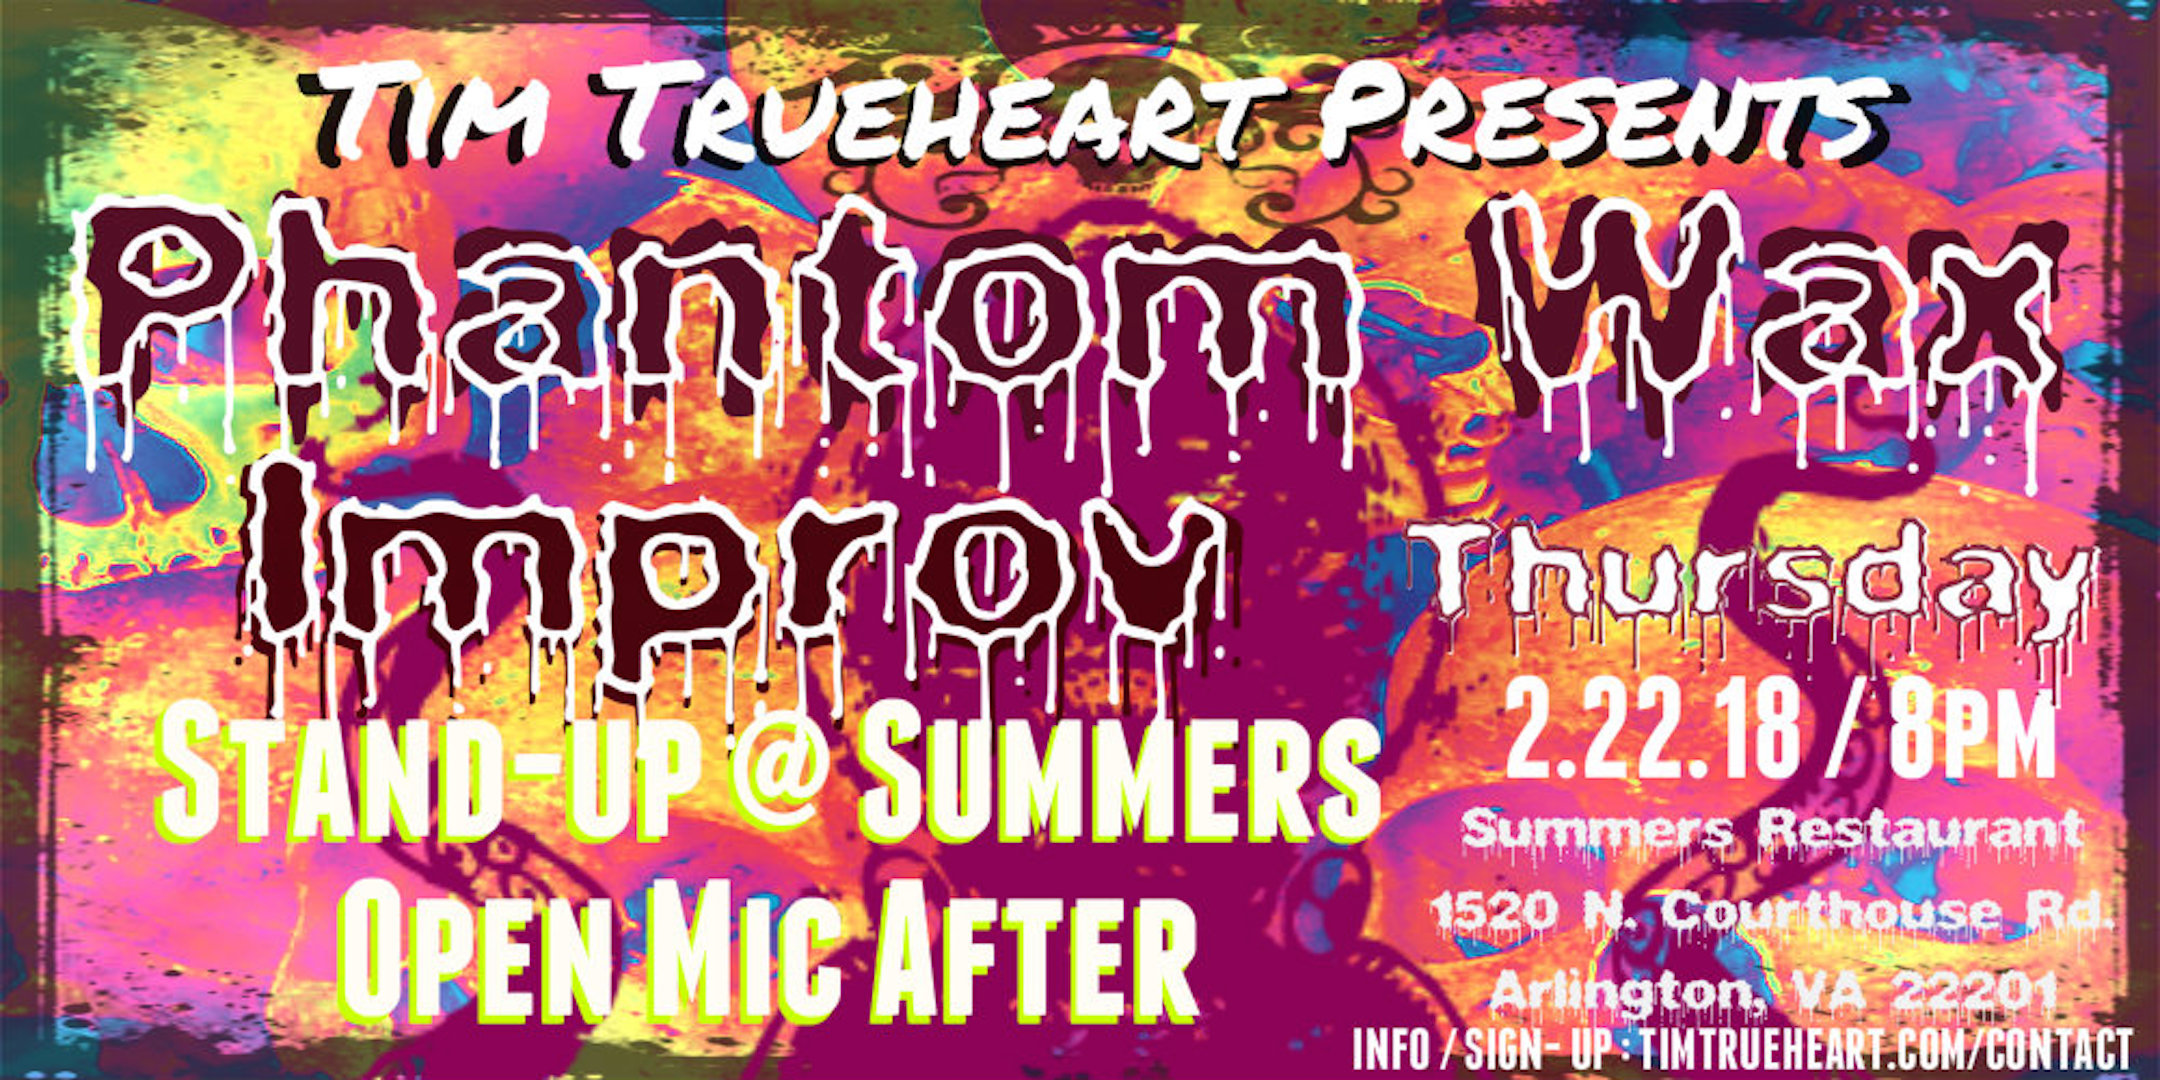 Thursday @ Summers Phantom Wax!.jpg